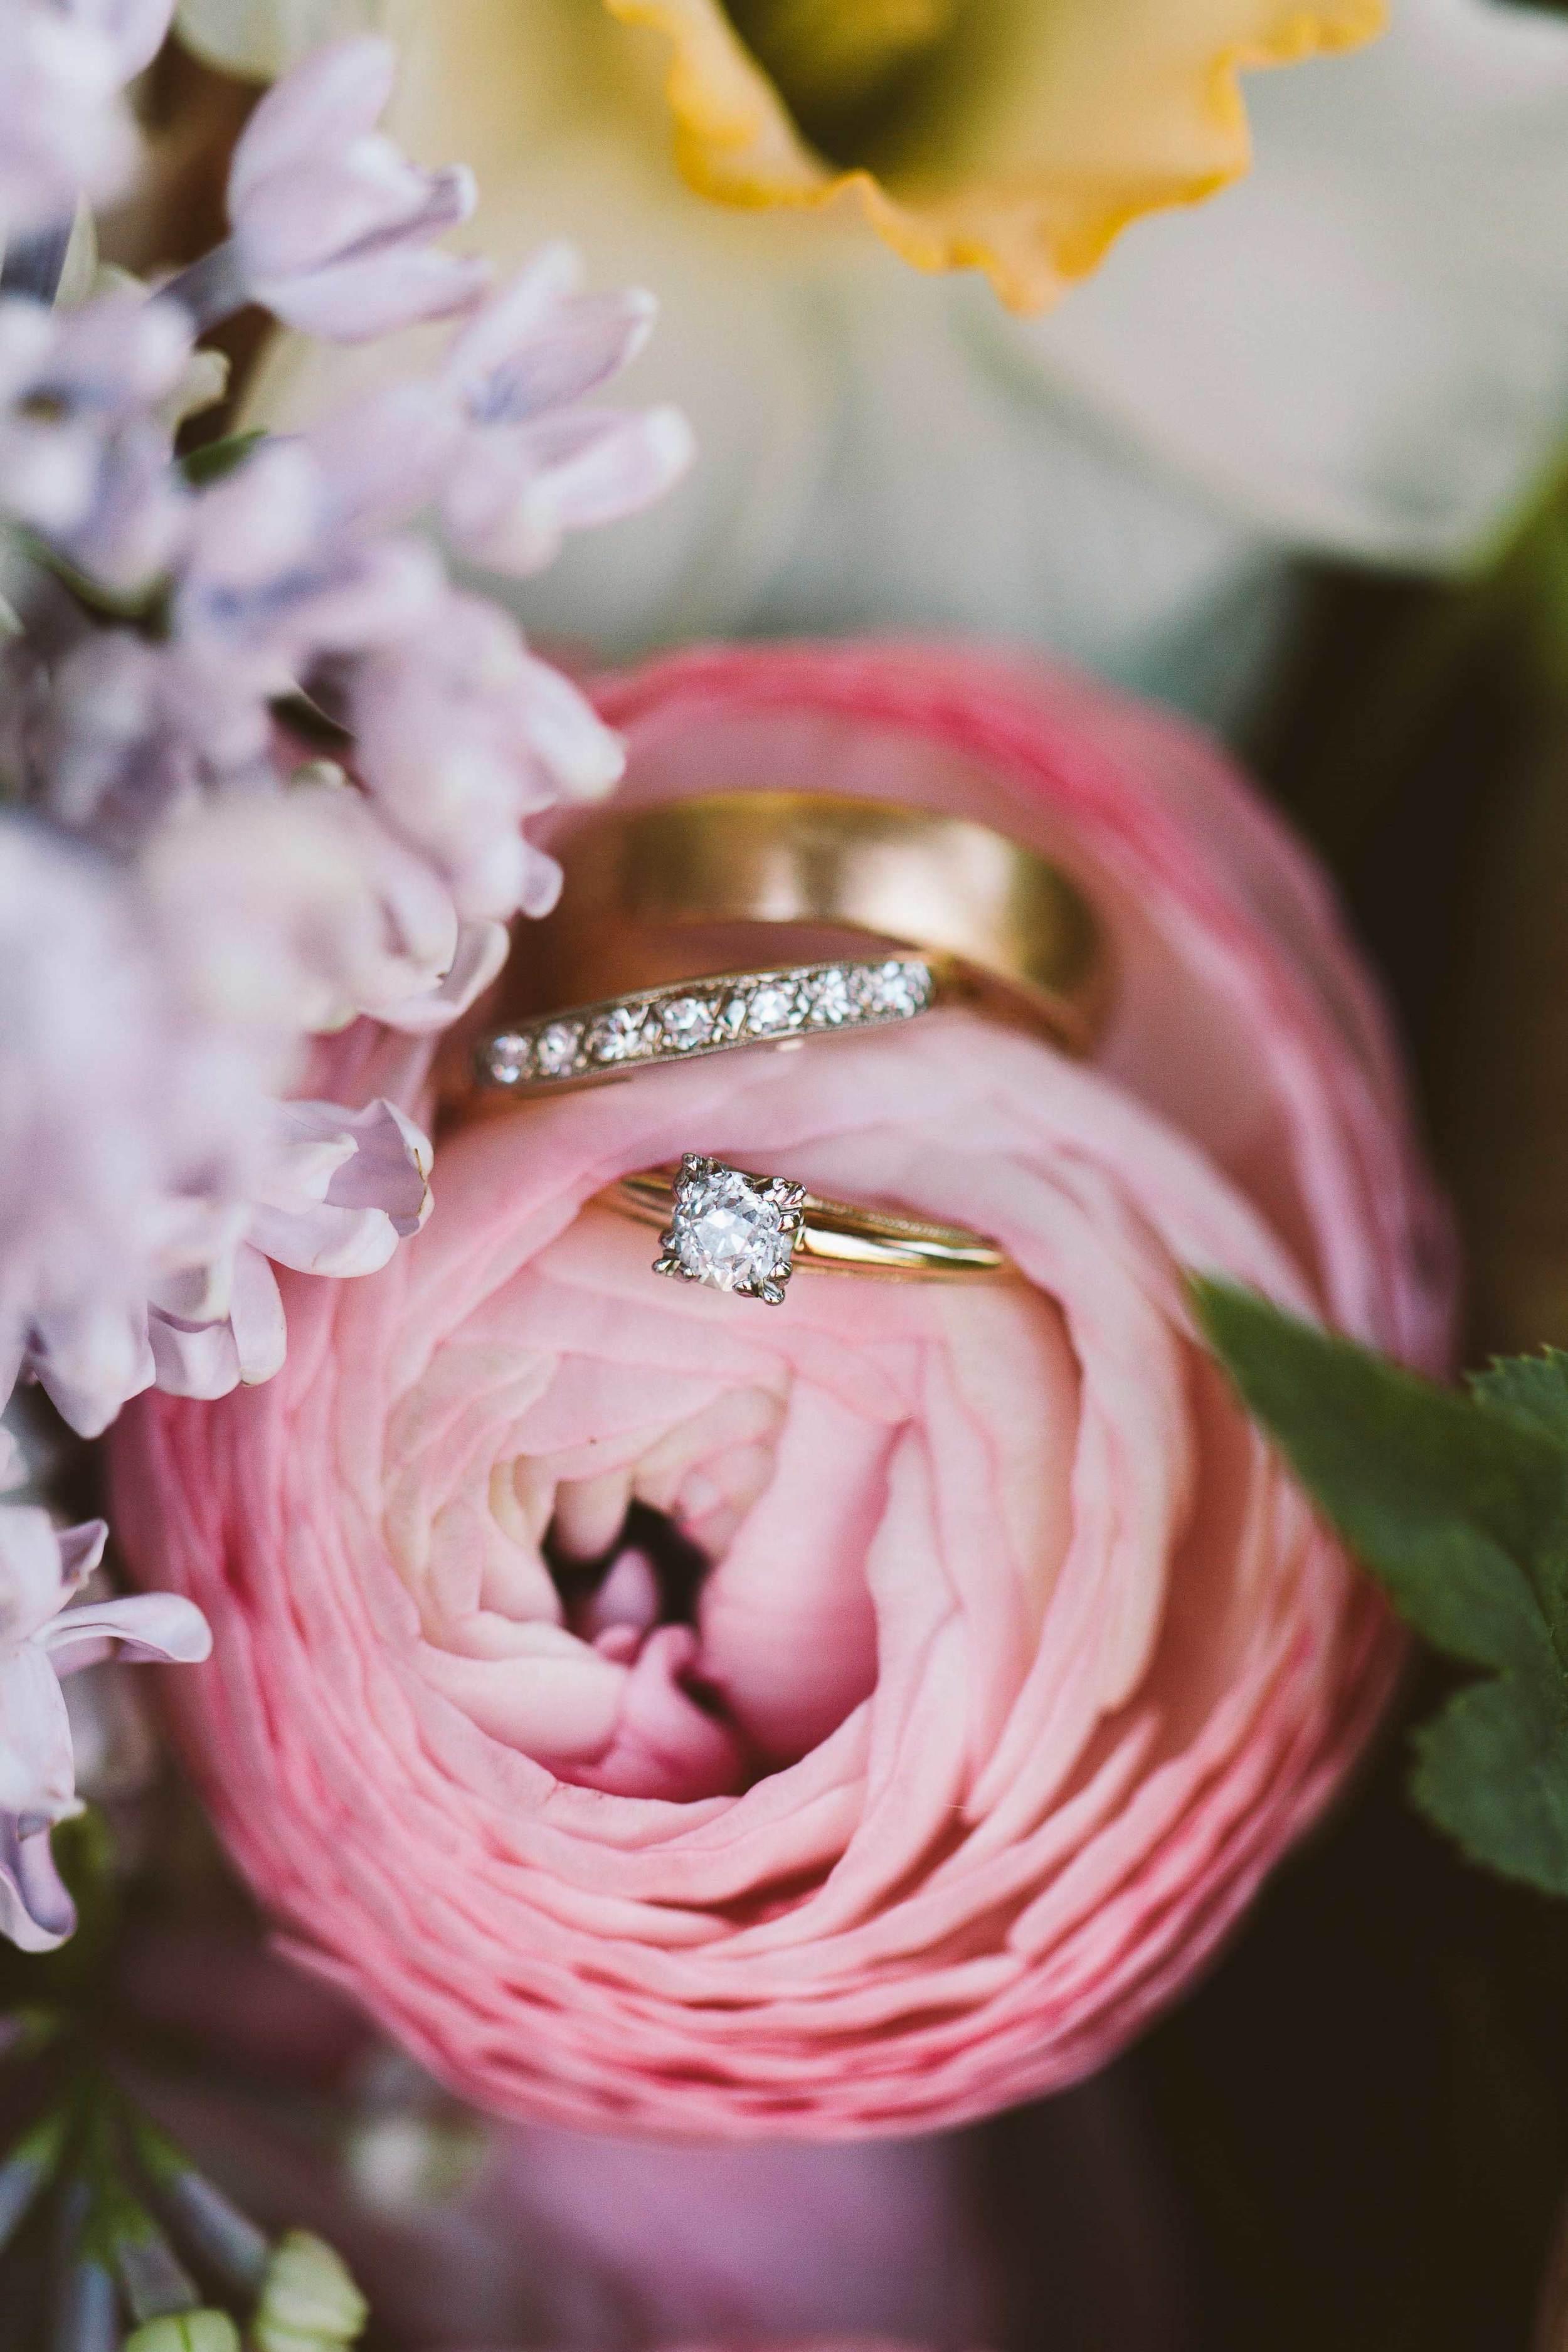 Radka-Wedding-Radka-April-18-2015-0016.jpg